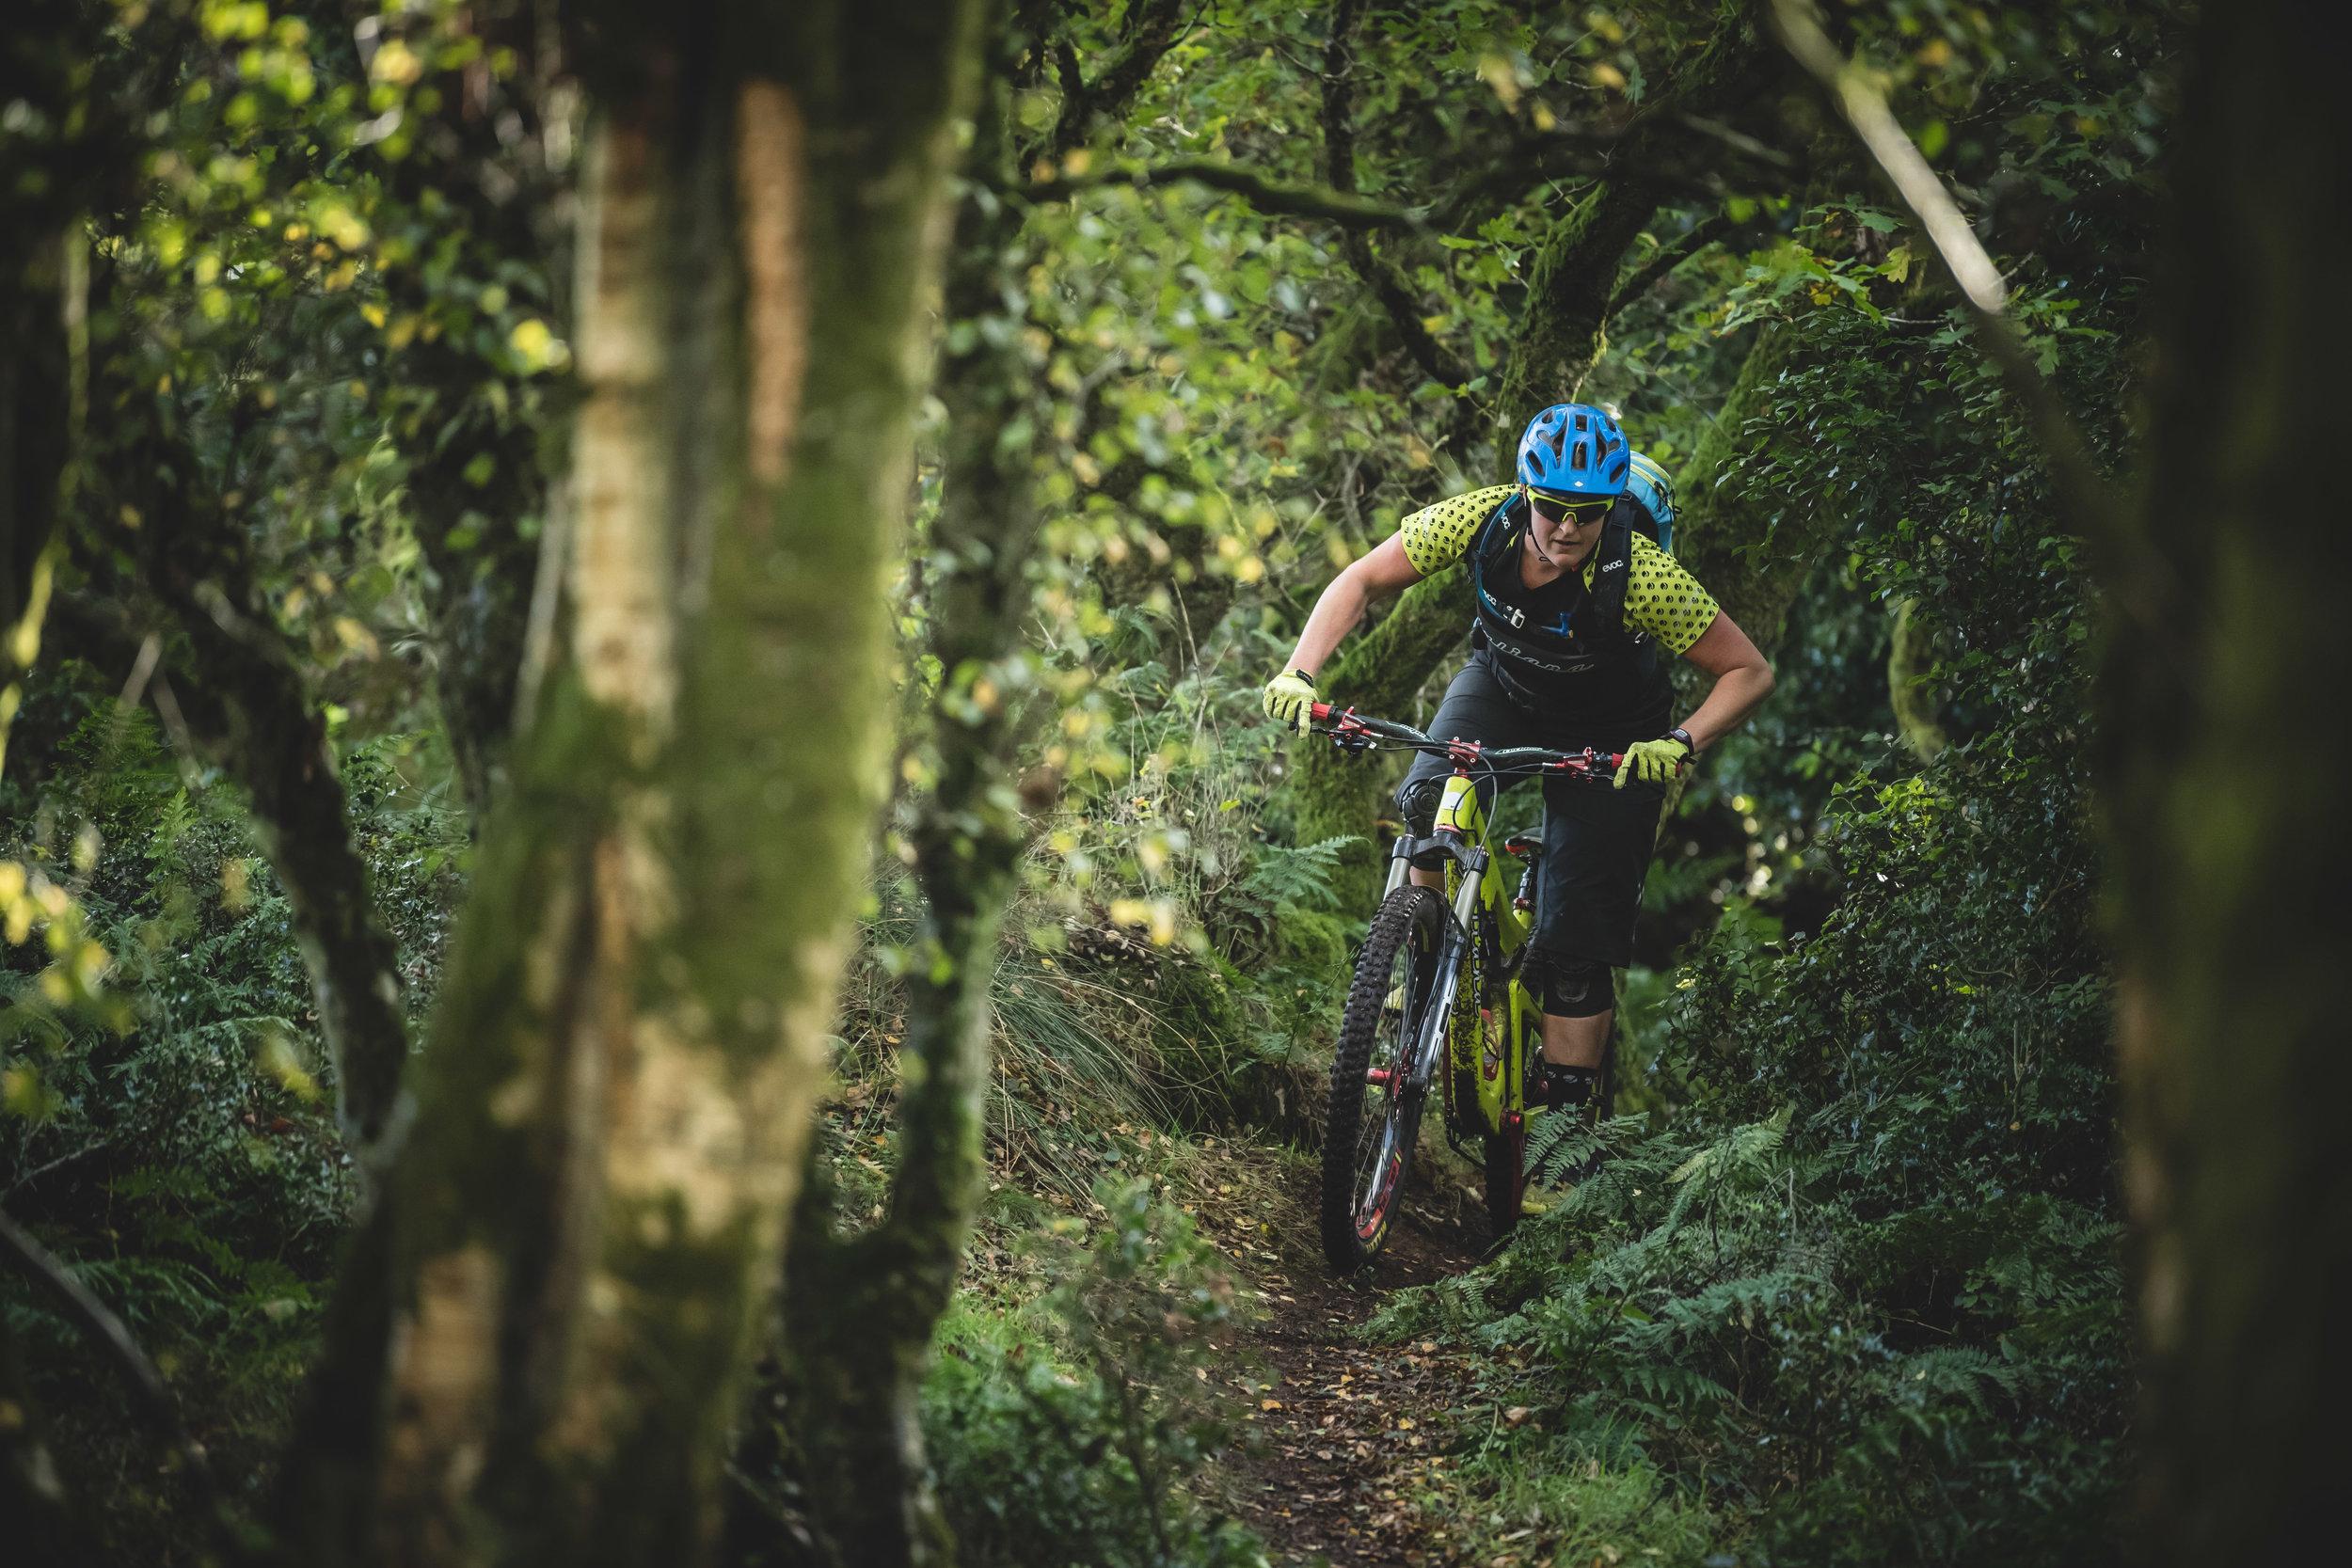 Woodland trail riding